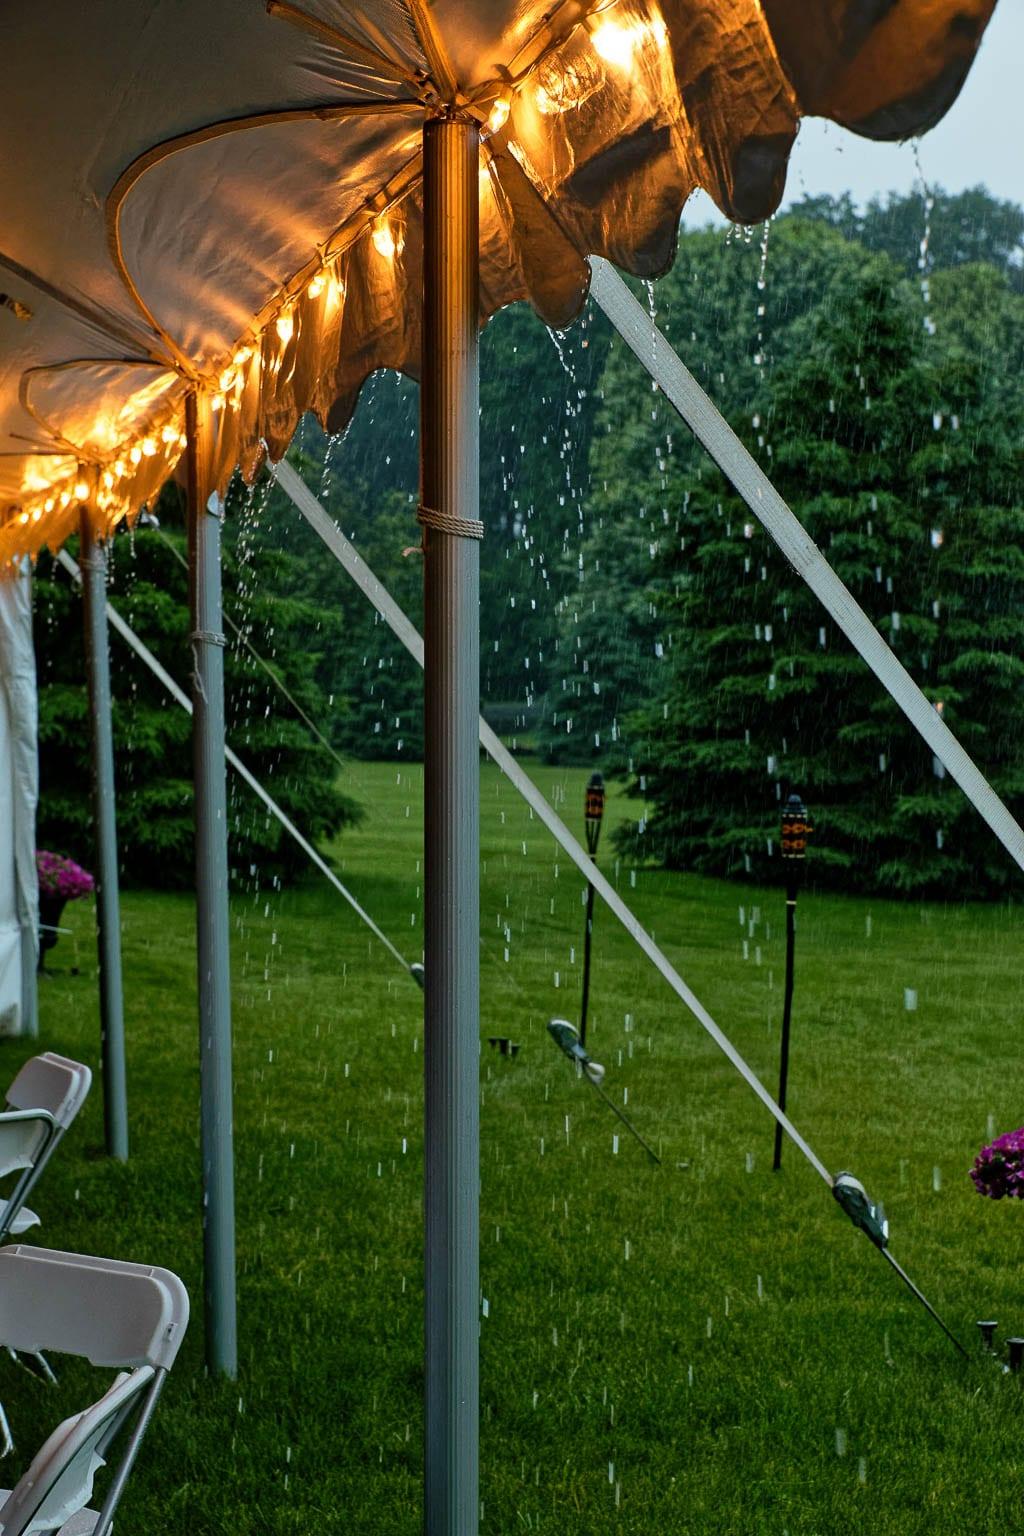 rainy outdoor